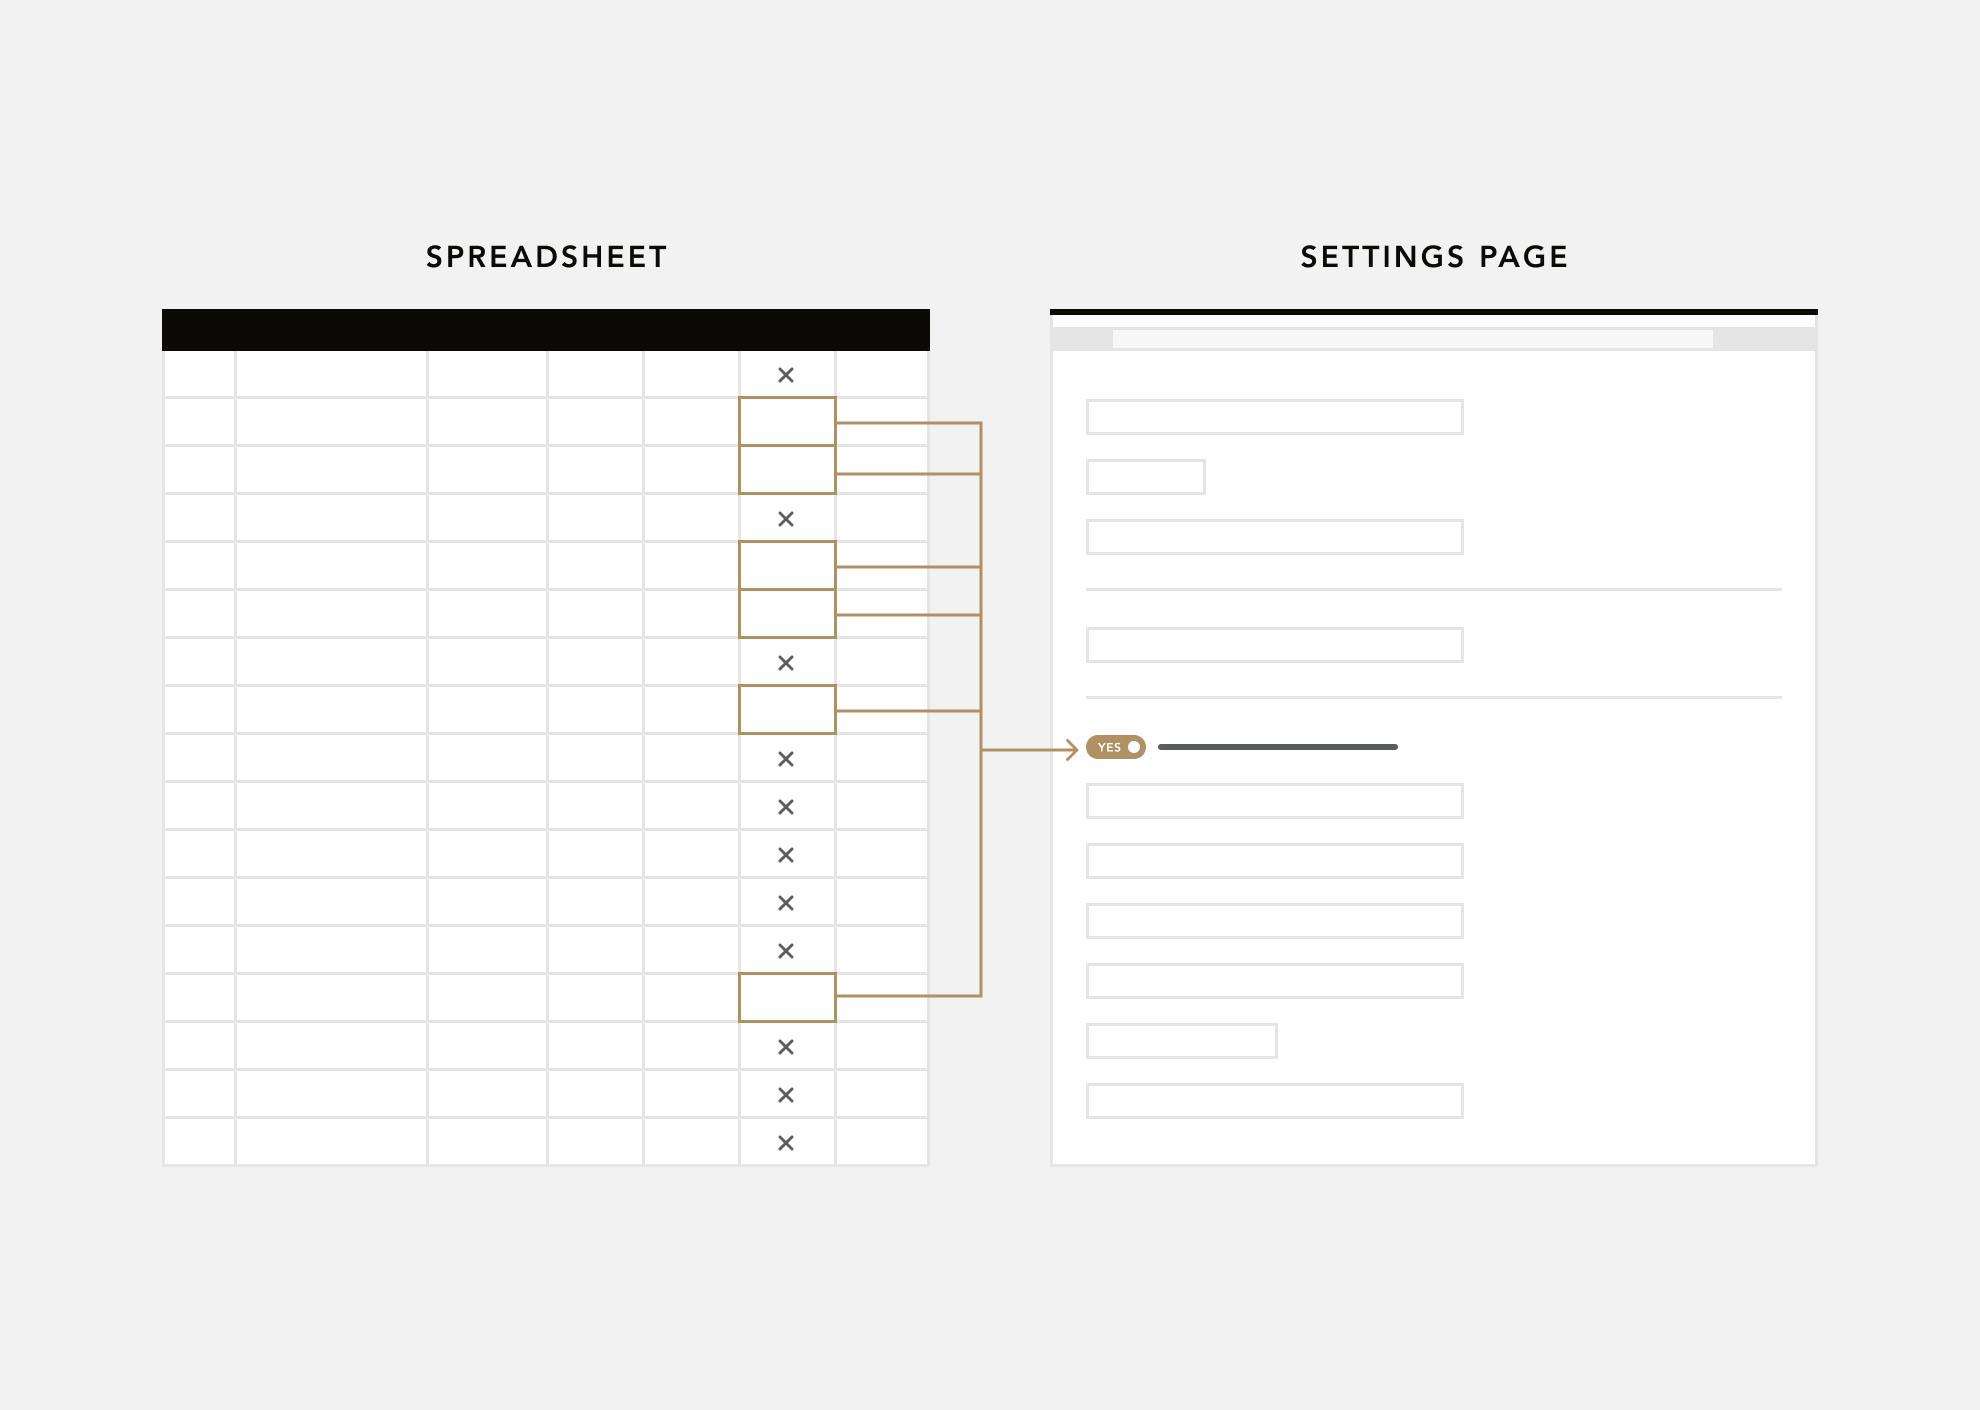 Migrating Spreadsheet Into Database